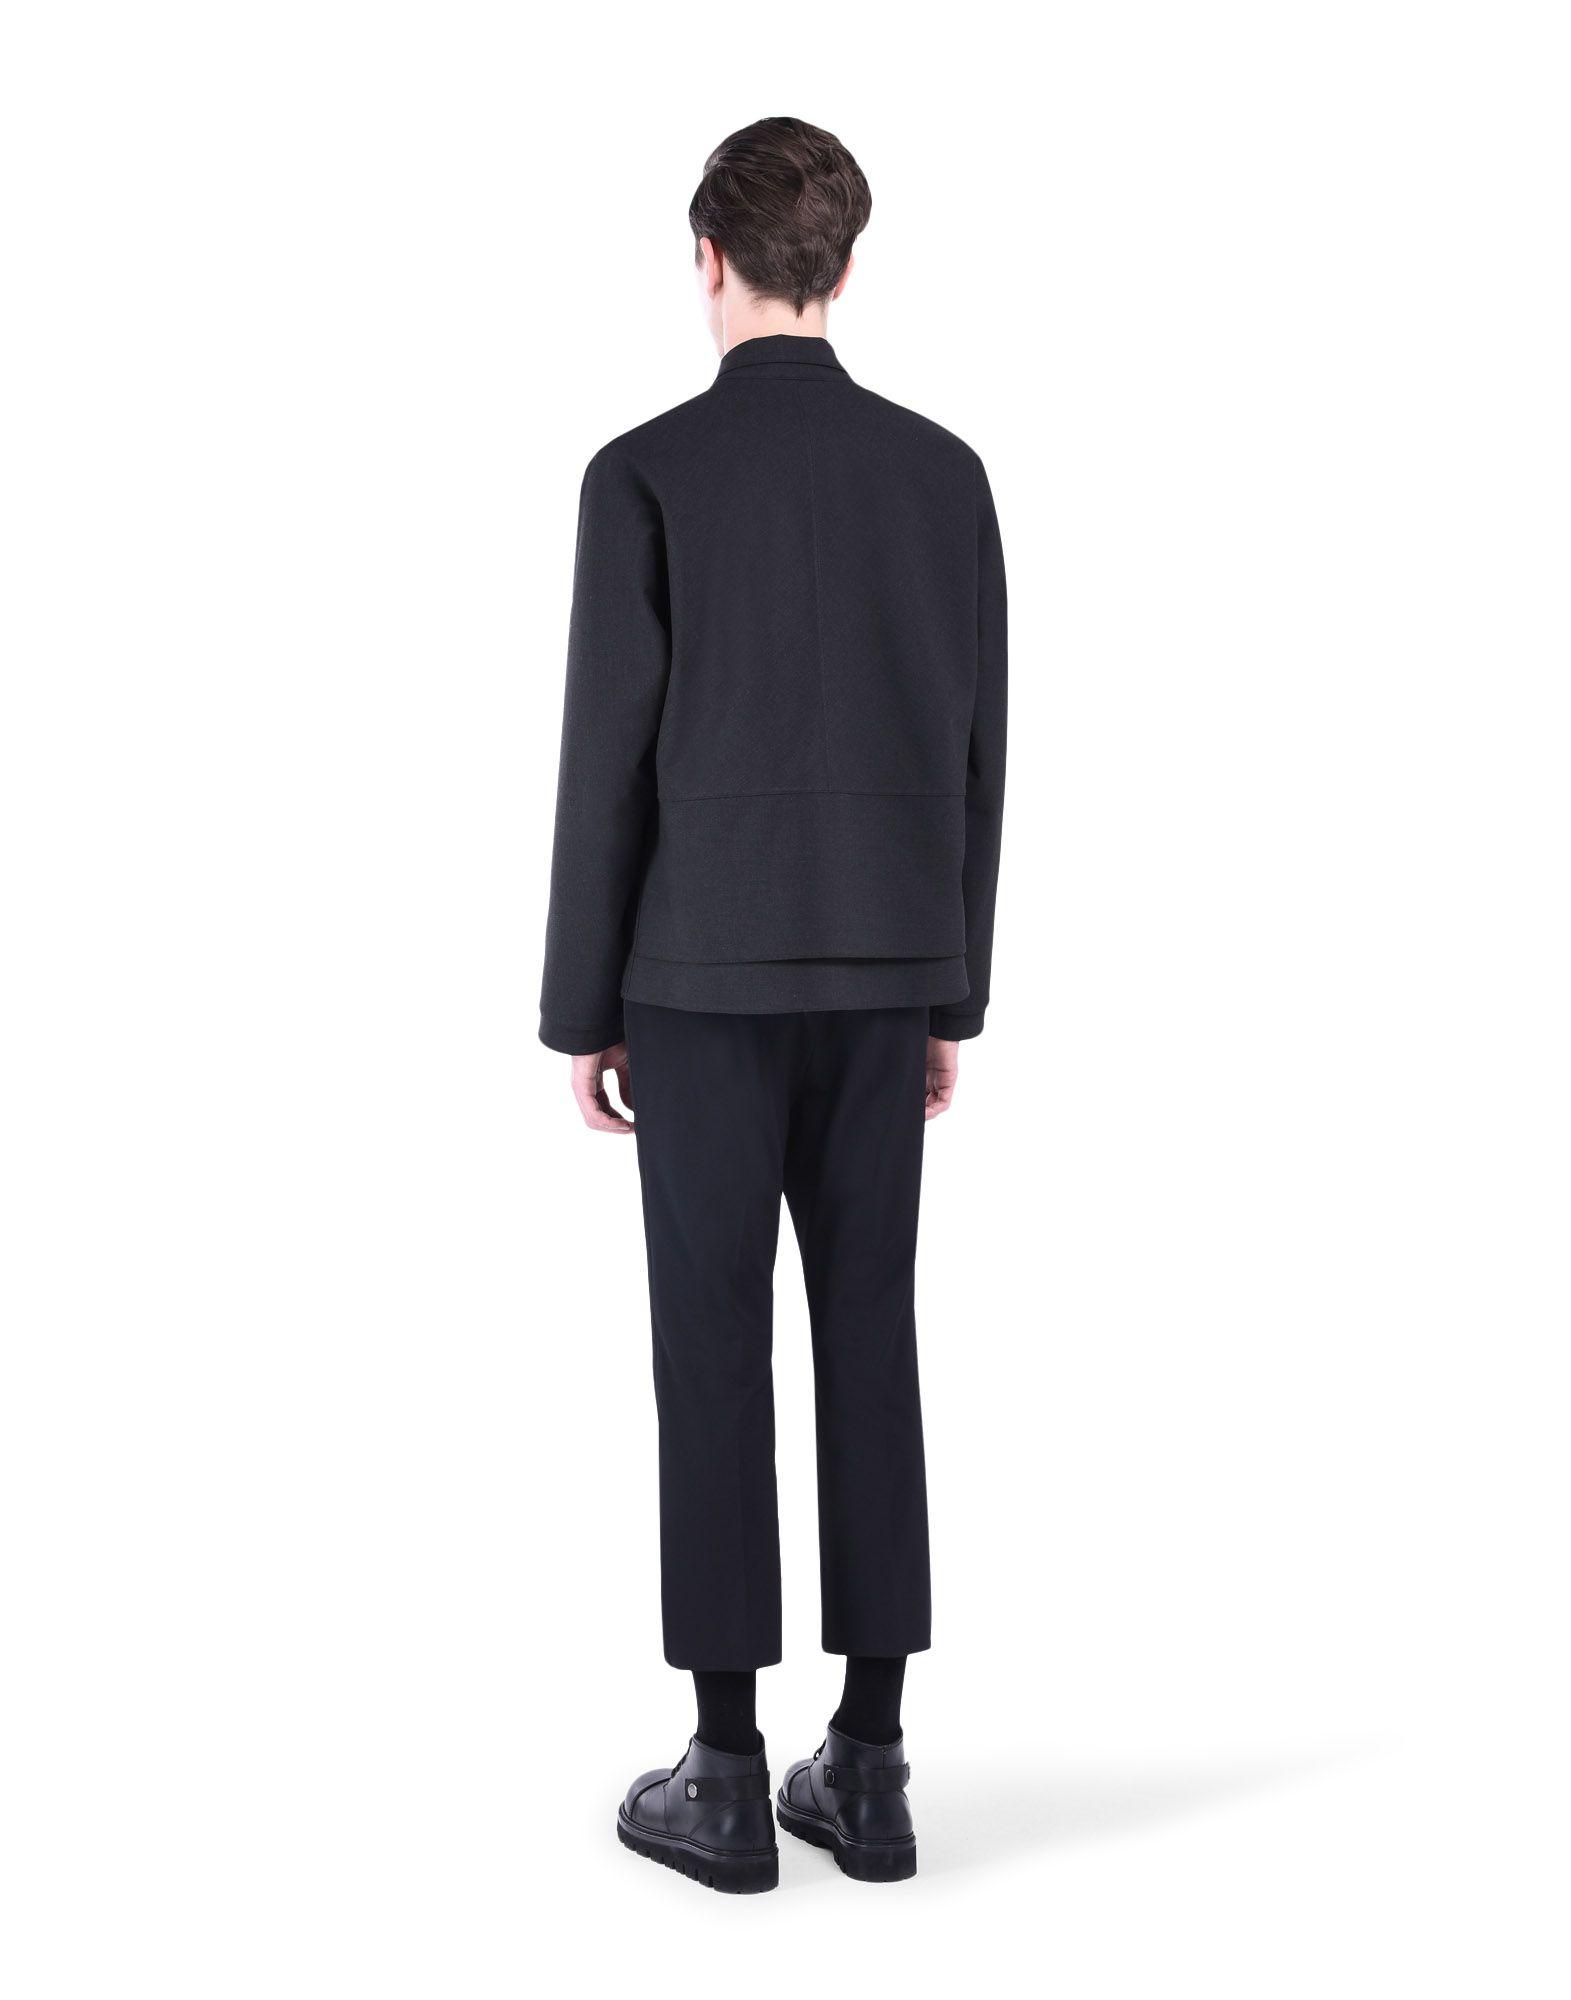 BLOUSON - JIL SANDER Online Store